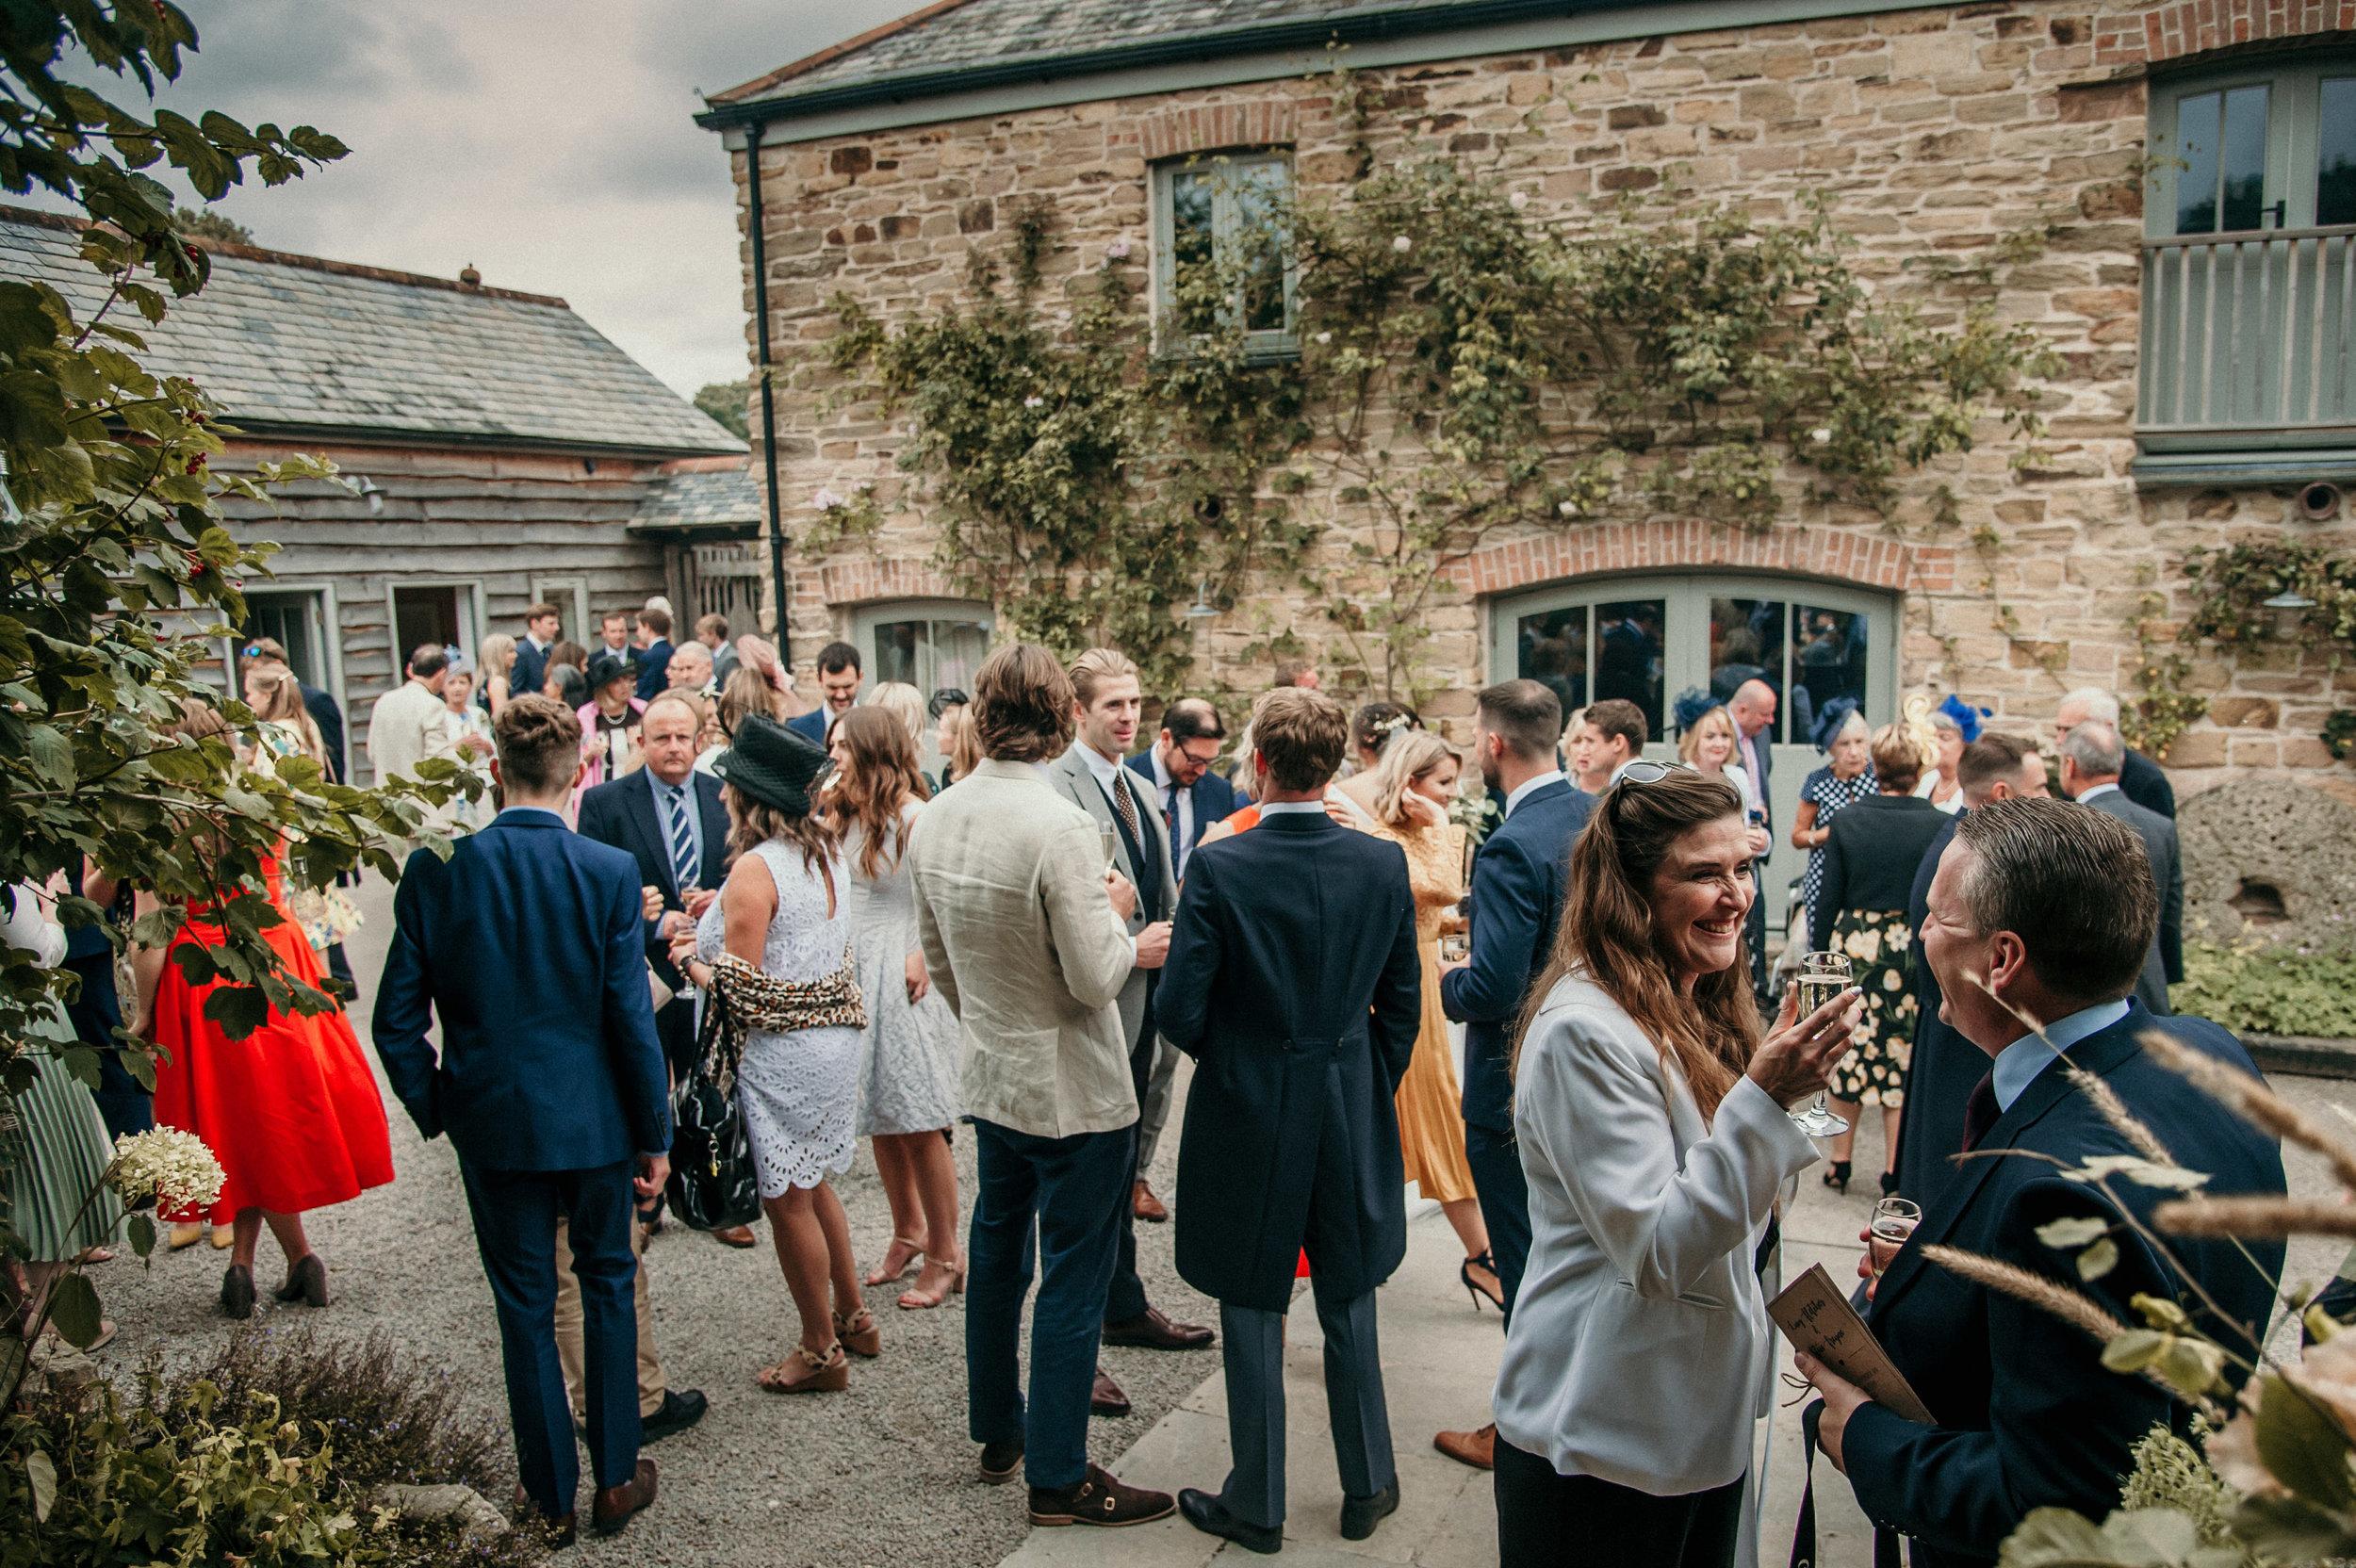 nancarrow-farm-wedding-photographer-cornwall-22.jpg